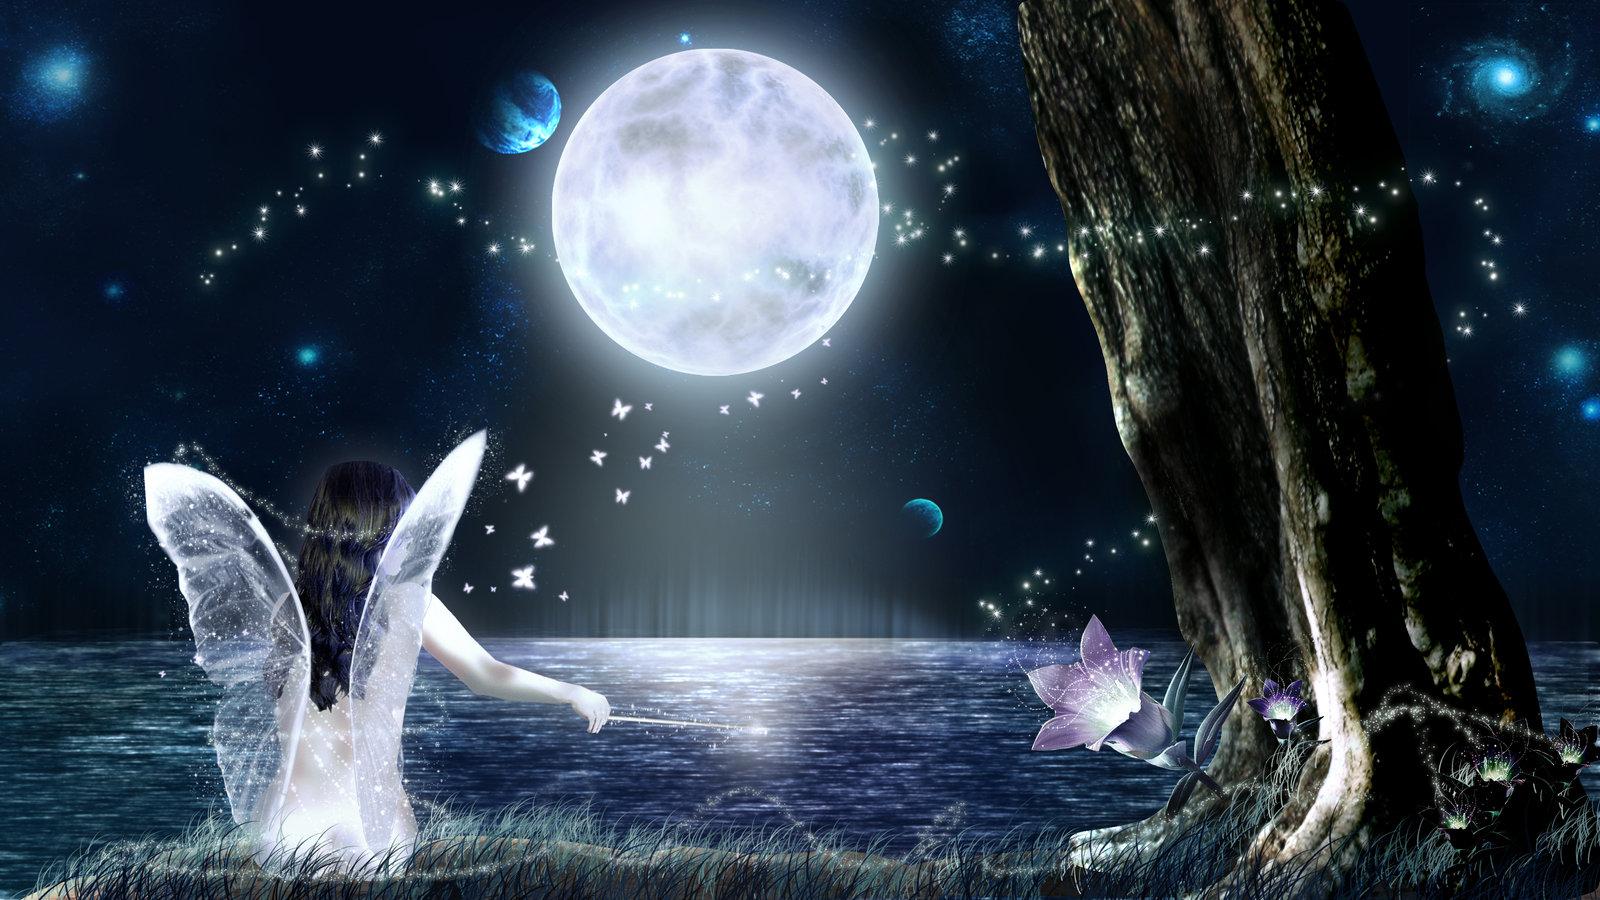 lonely fairy in the moonlight by music50933 - La force d'être une femme